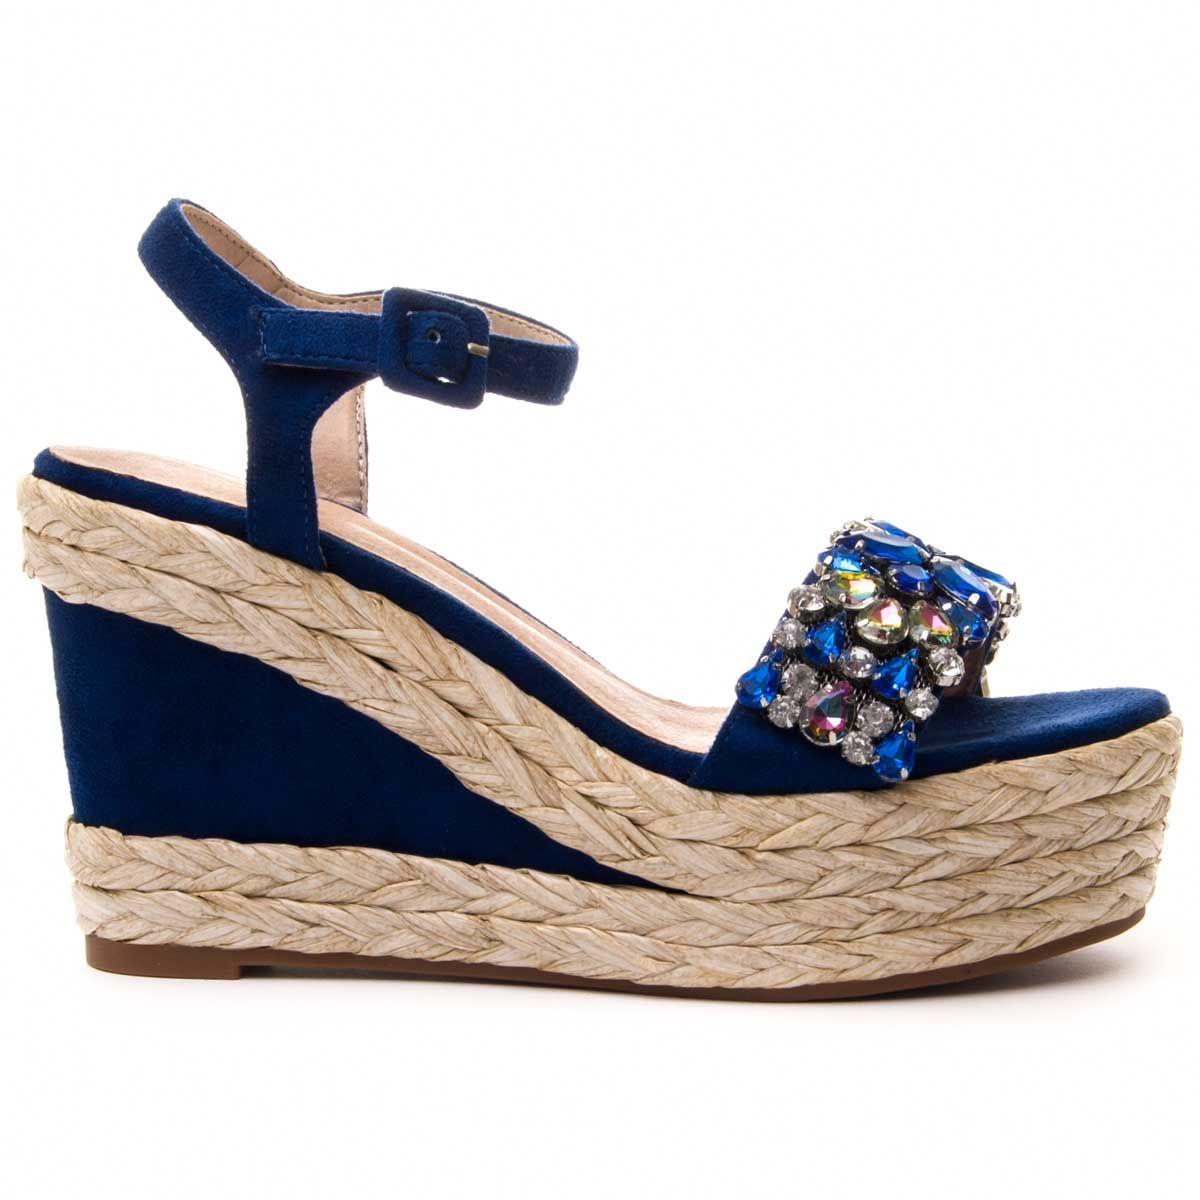 Montevita Ankle Strap Wedge Espadrille in Blue